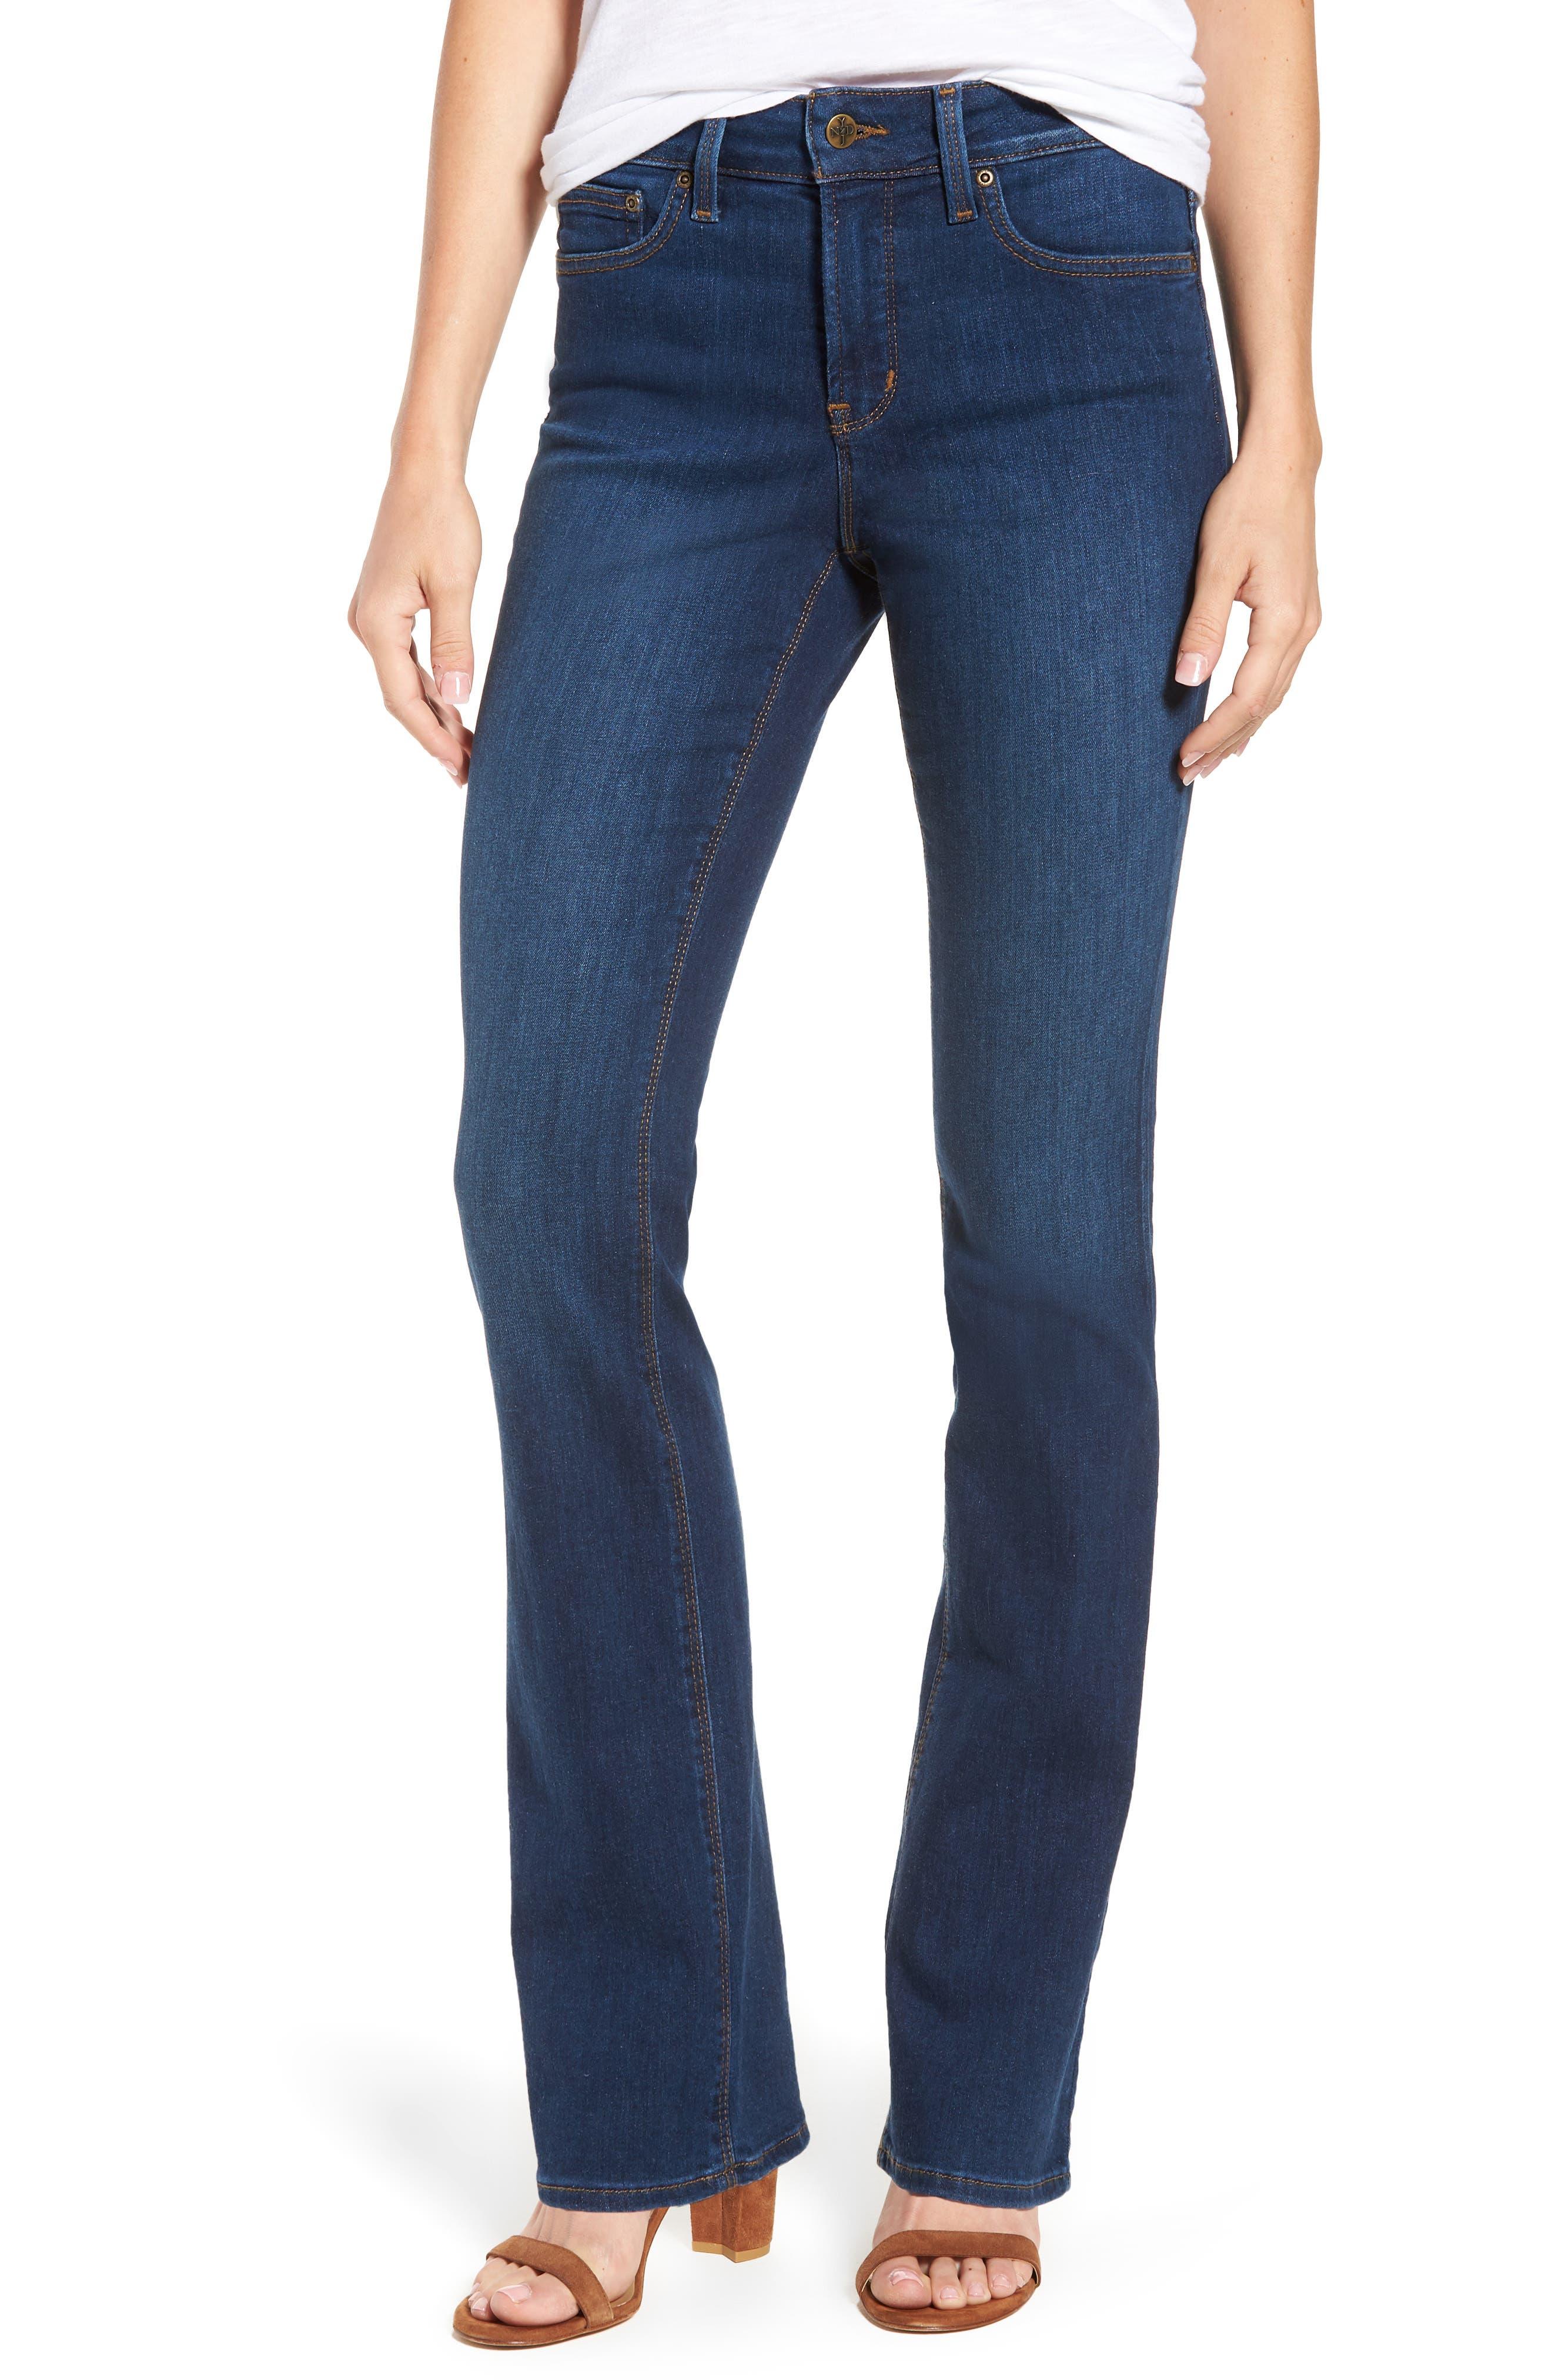 Billie Mini Bootcut Jeans,                         Main,                         color, Cooper